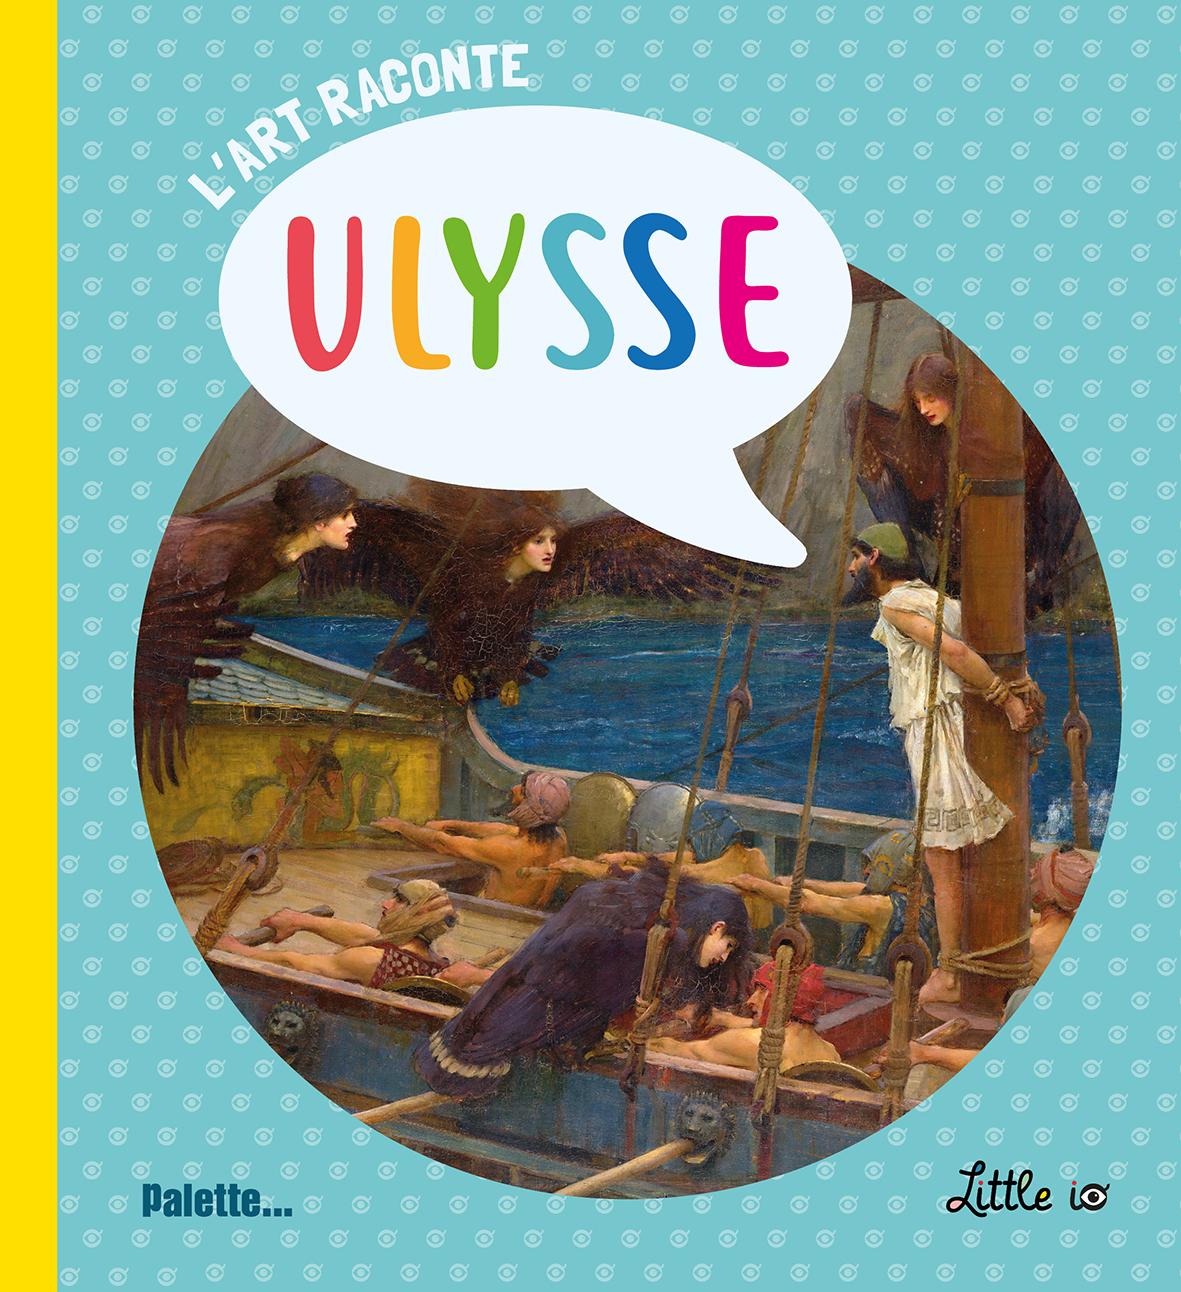 ART RACONTE ULYSSE (L')